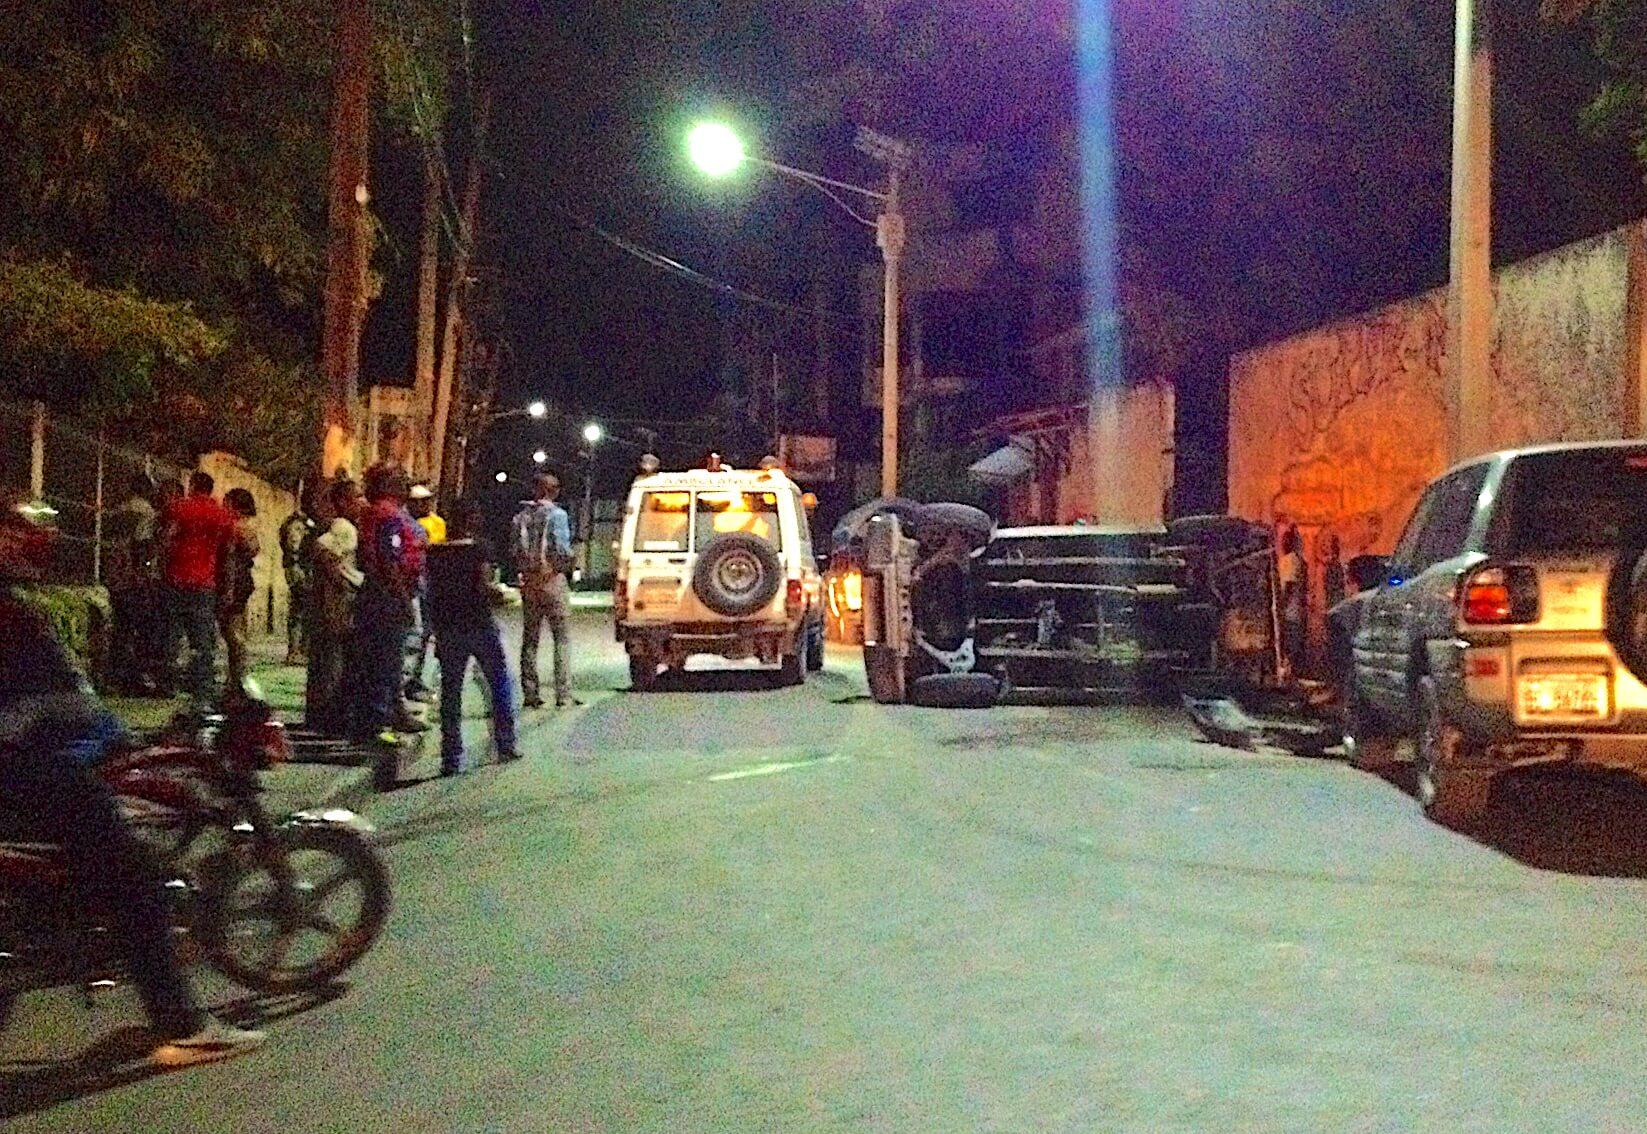 Haiti EMS 116 Response to Petionville Rollover, Port-au-Prince